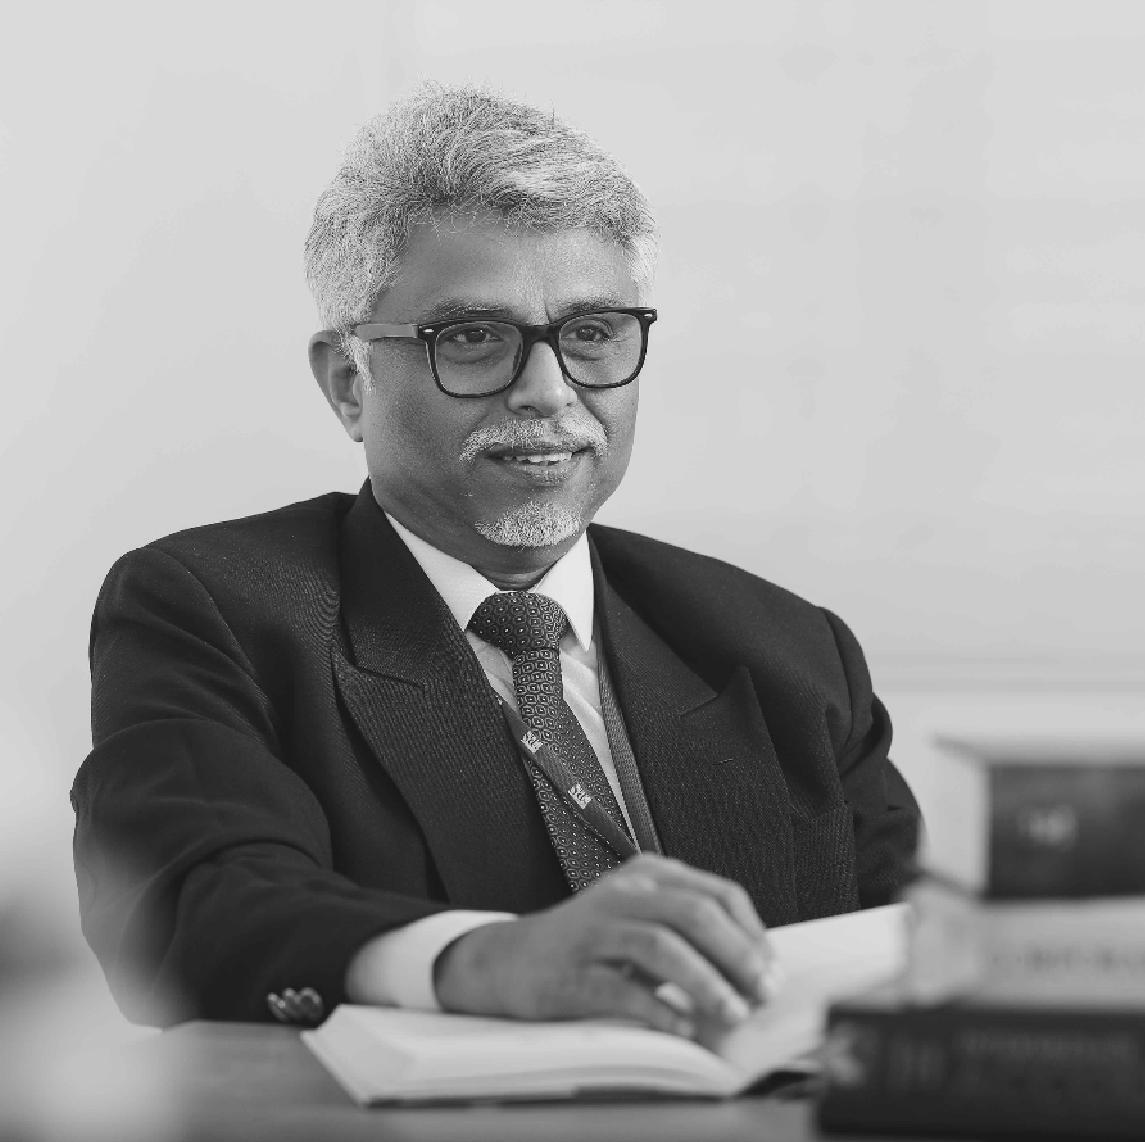 Dean/Prof. Sridar Natarajan is a Metallurgical Engineer from IIT Kharagpur- HR courses in Chennai